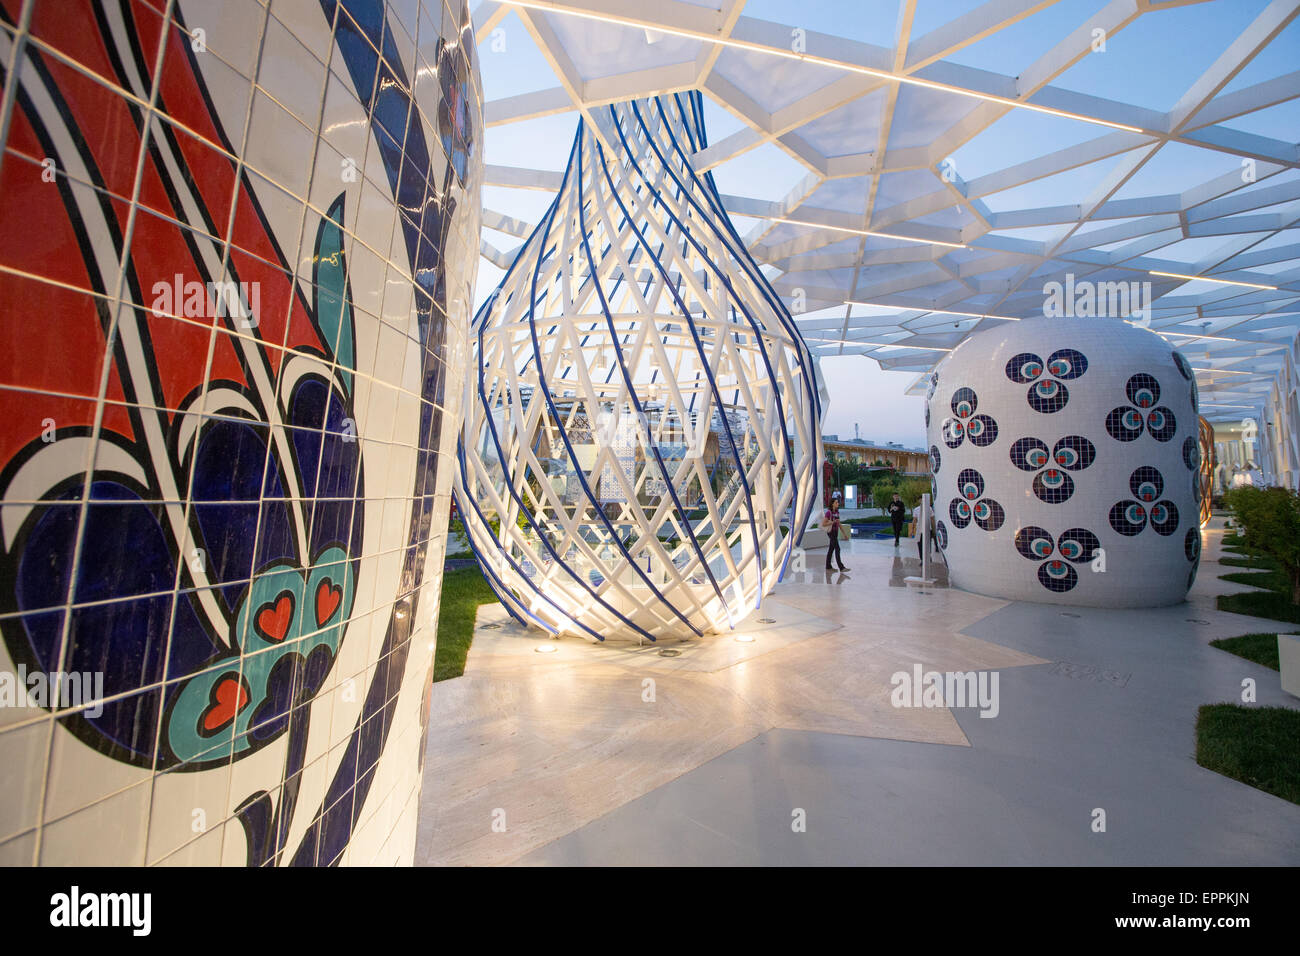 Turkey pavilion, Expo 2015 Milan - Stock Image